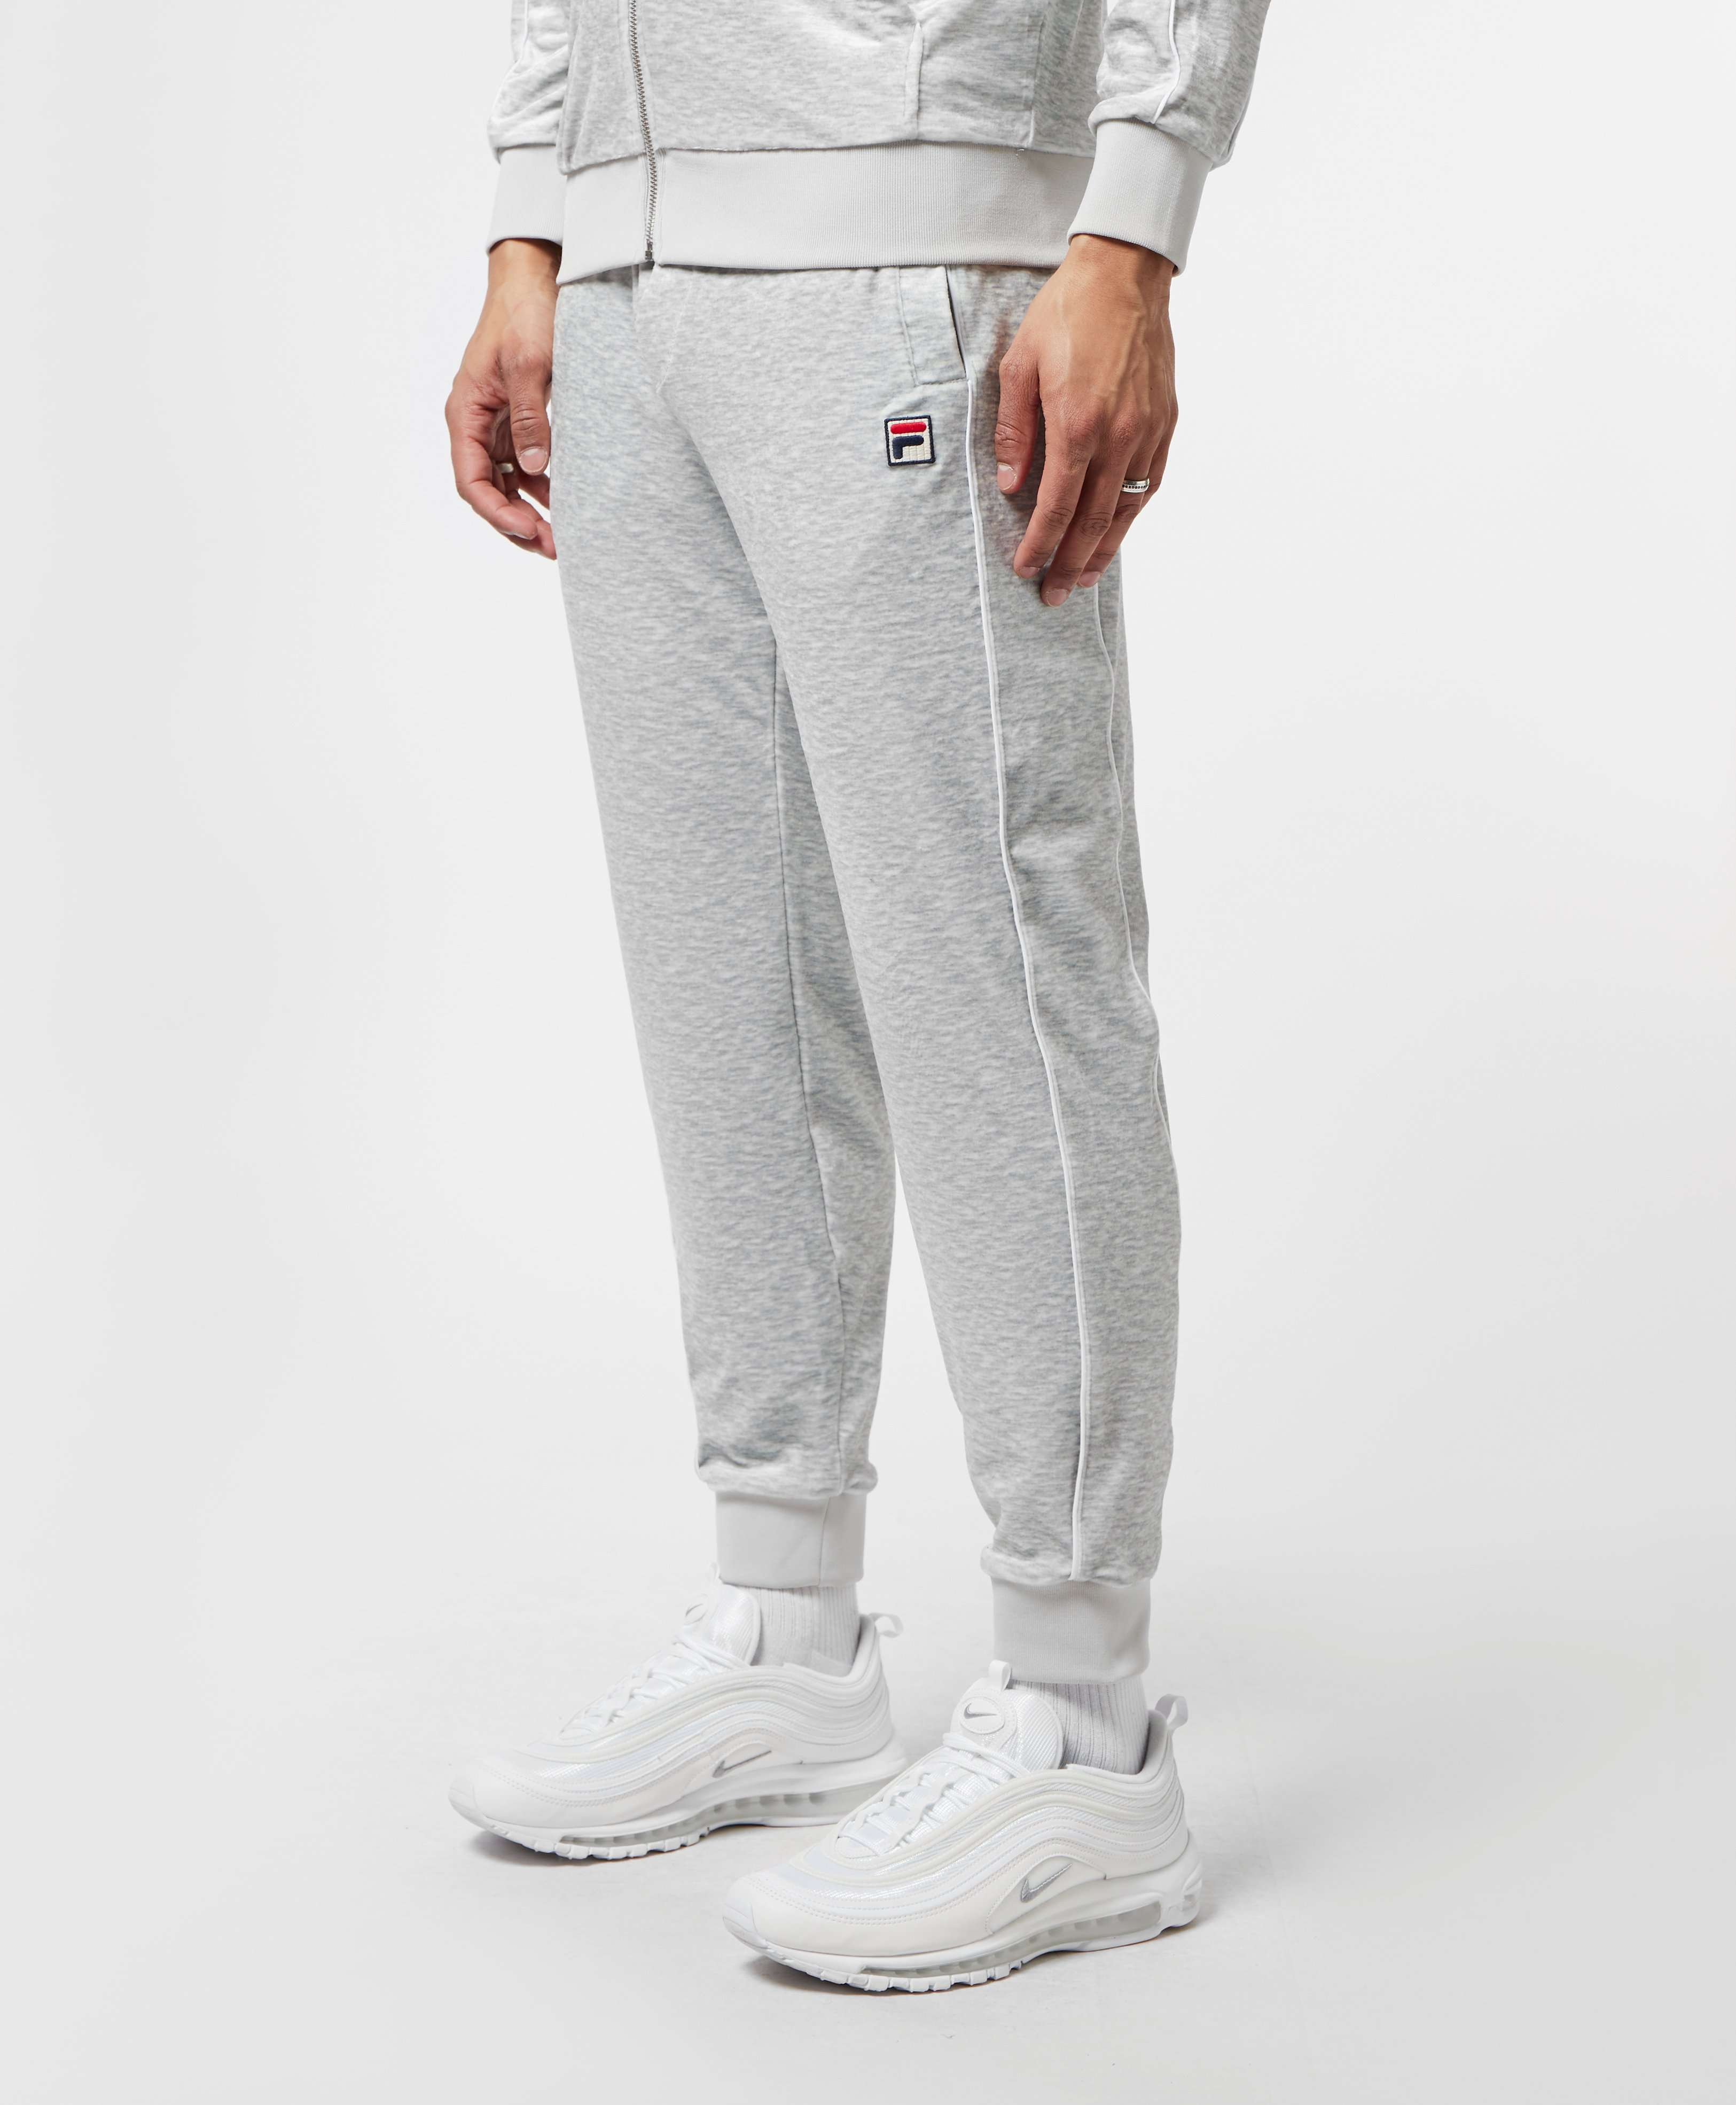 Fila Velour Cuffed Fleece Pants